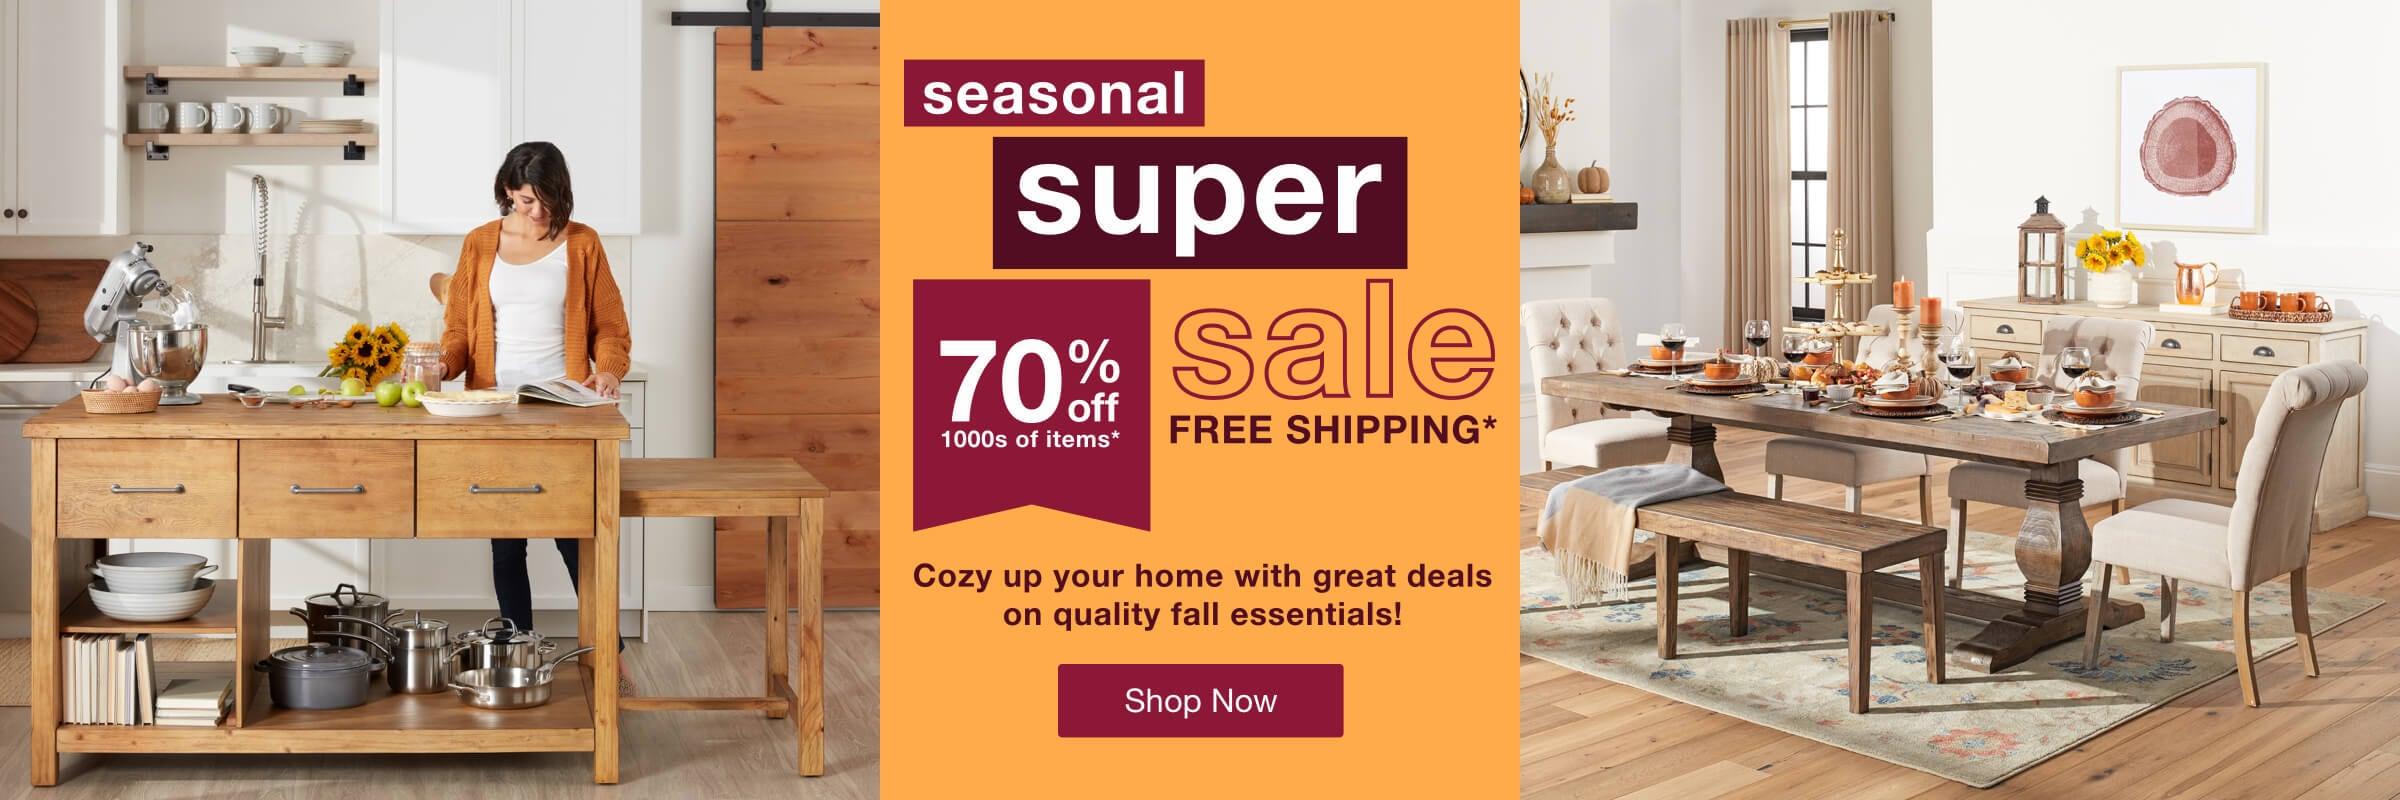 Seasonal Super Sale desktop